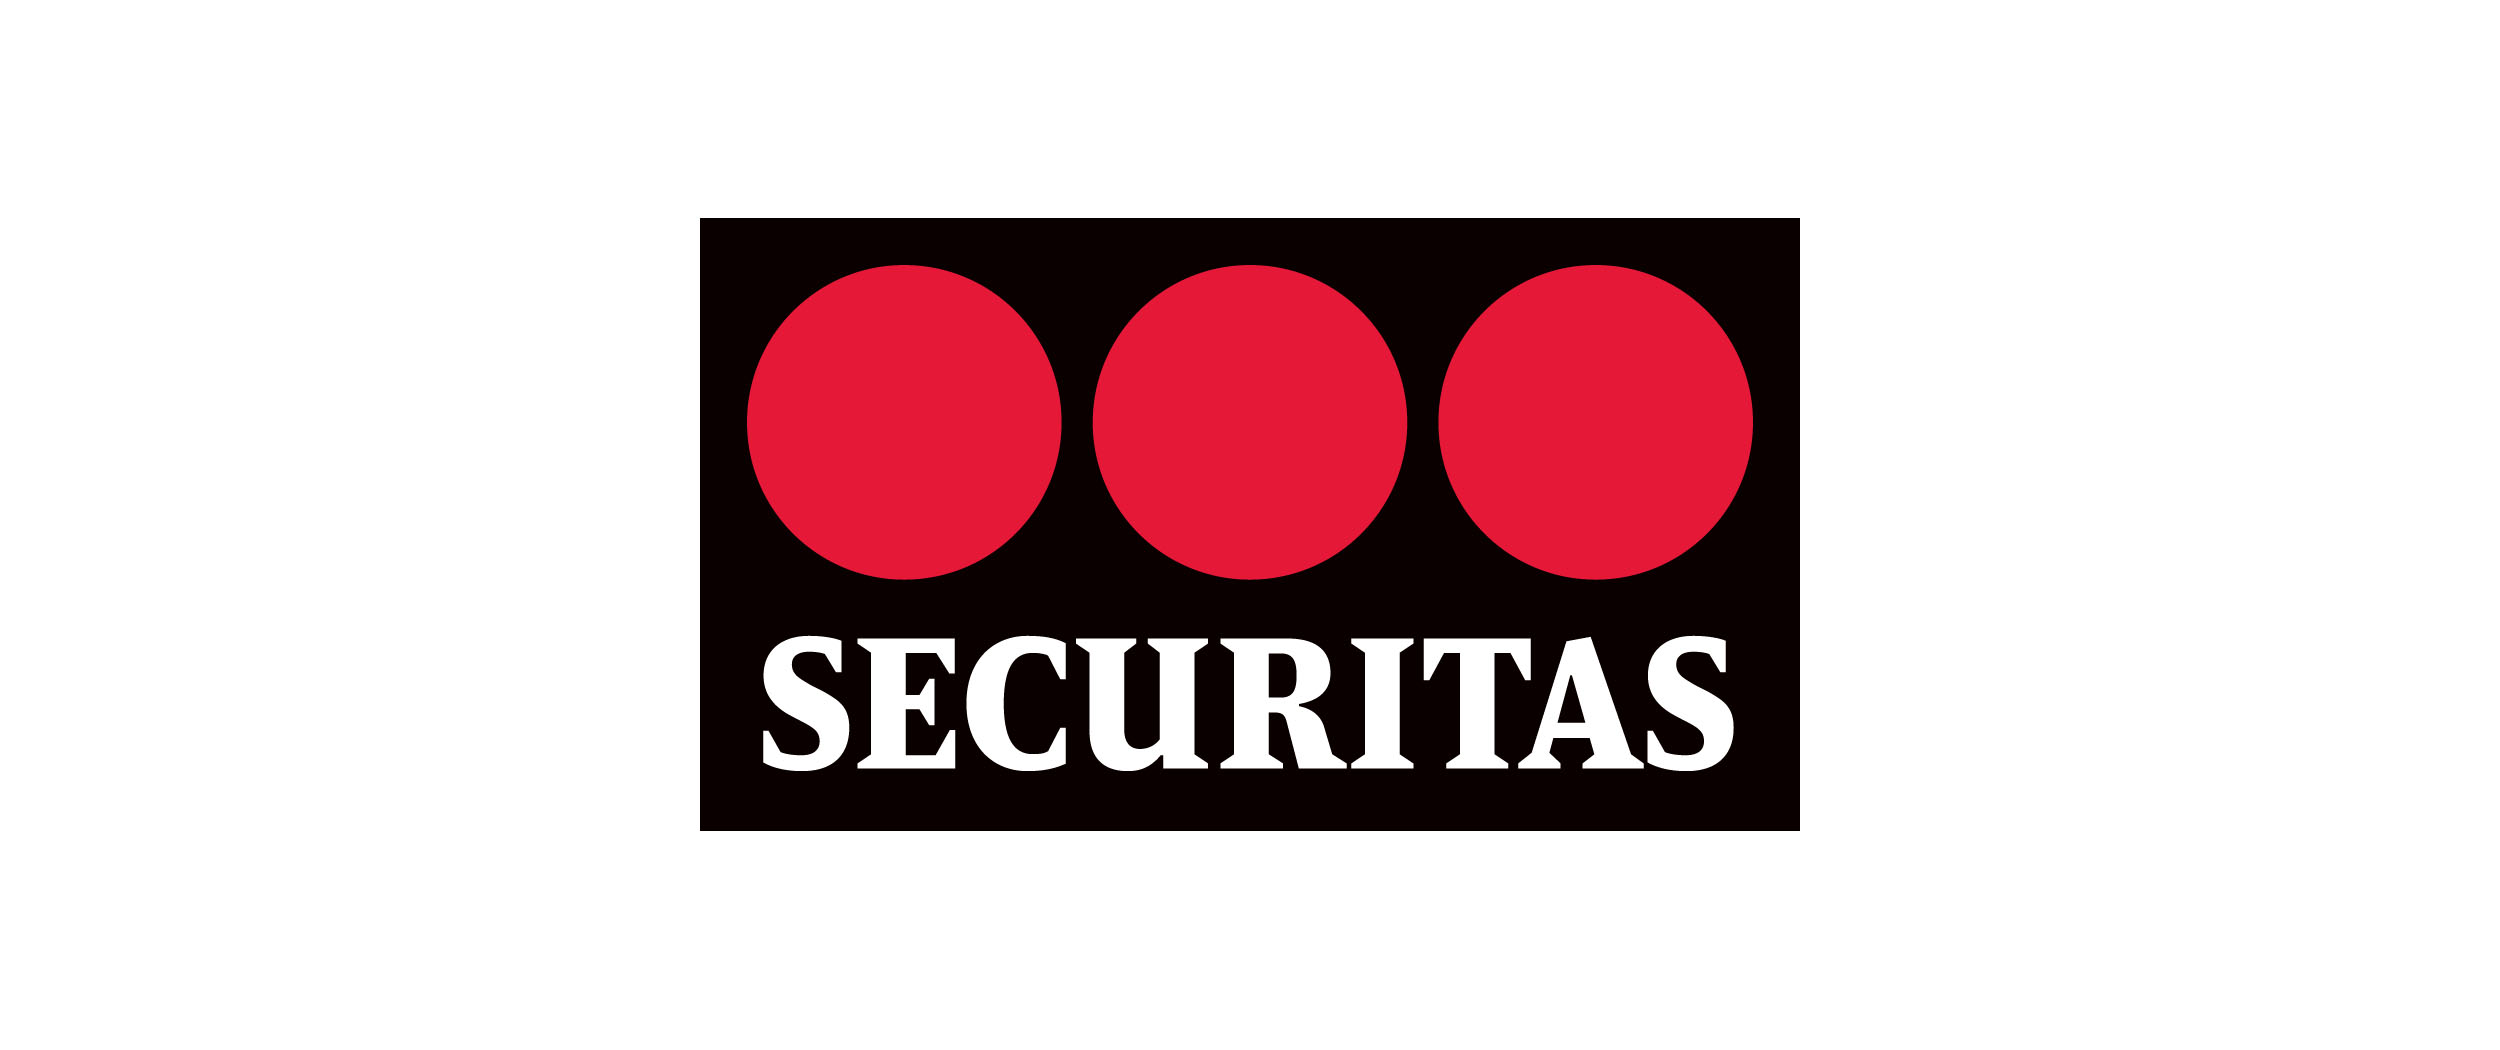 Securitas EPS-1_Securitas_186.jpg